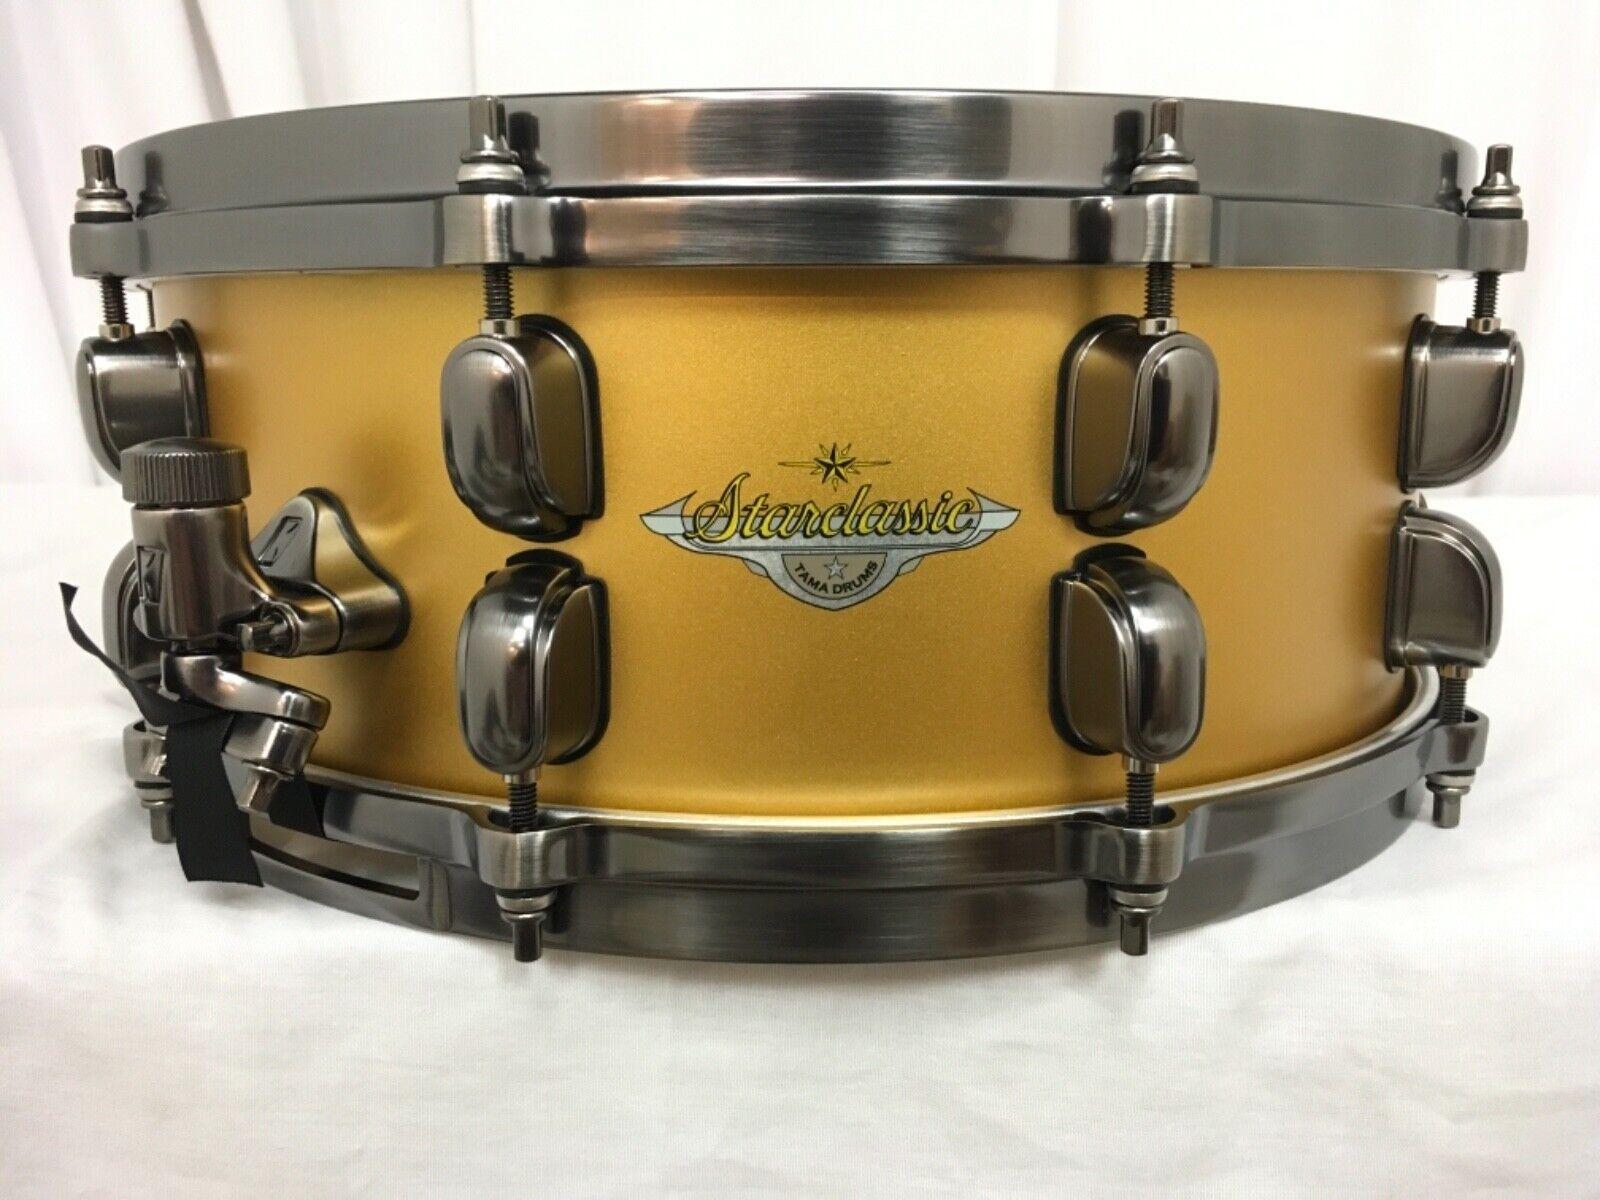 Tama Starclassic Maple 14  X 5.5  Snare Drum Satin Aztec Gold Metallic Brand New